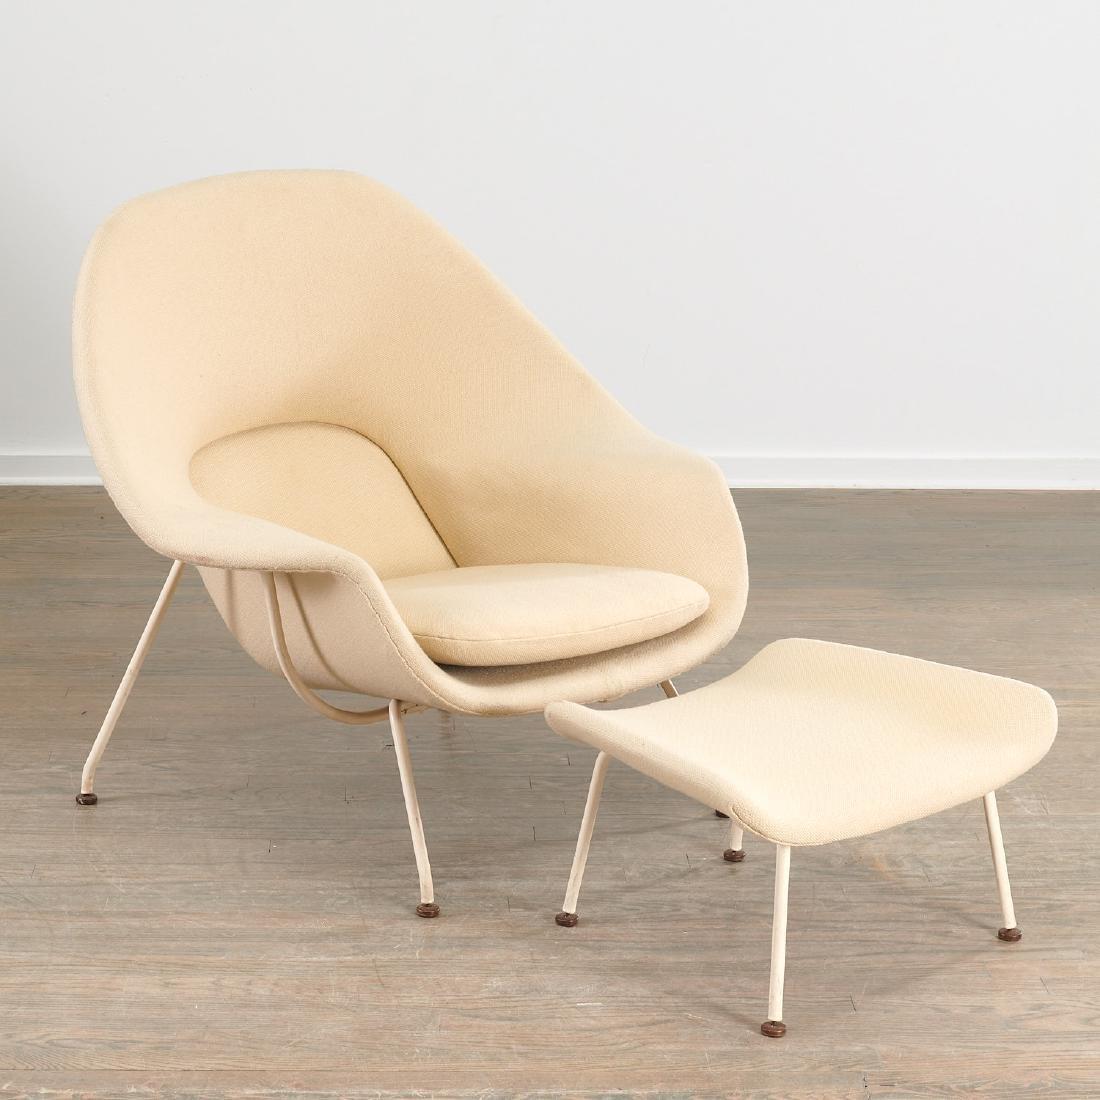 Vintage Eero Saarinen Womb chair and ottoman